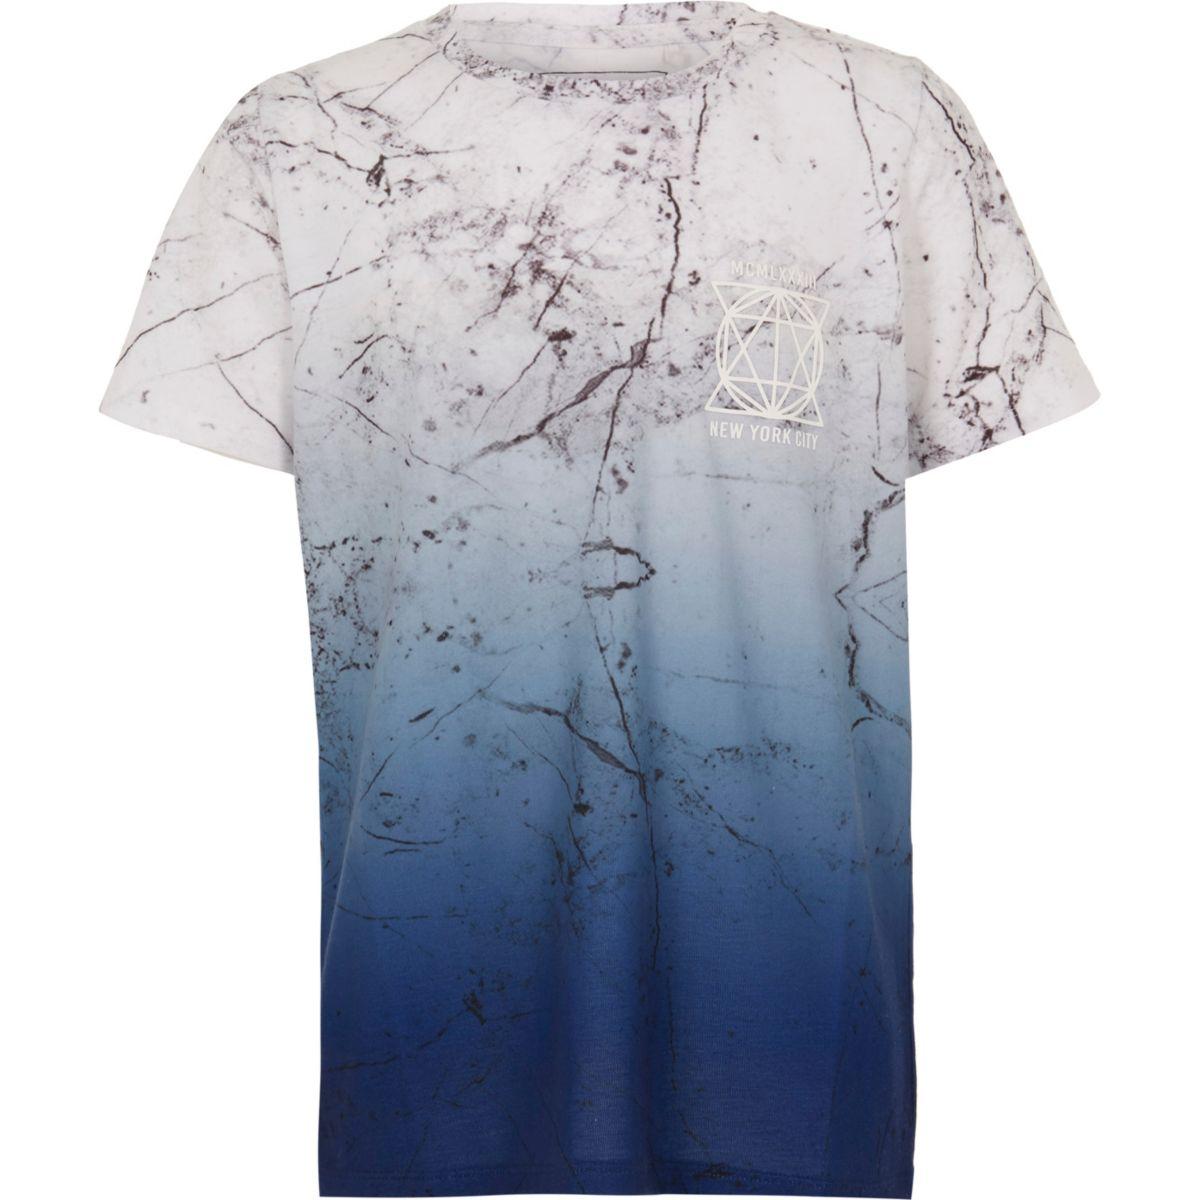 Boys grey marble crackle print T-shirt